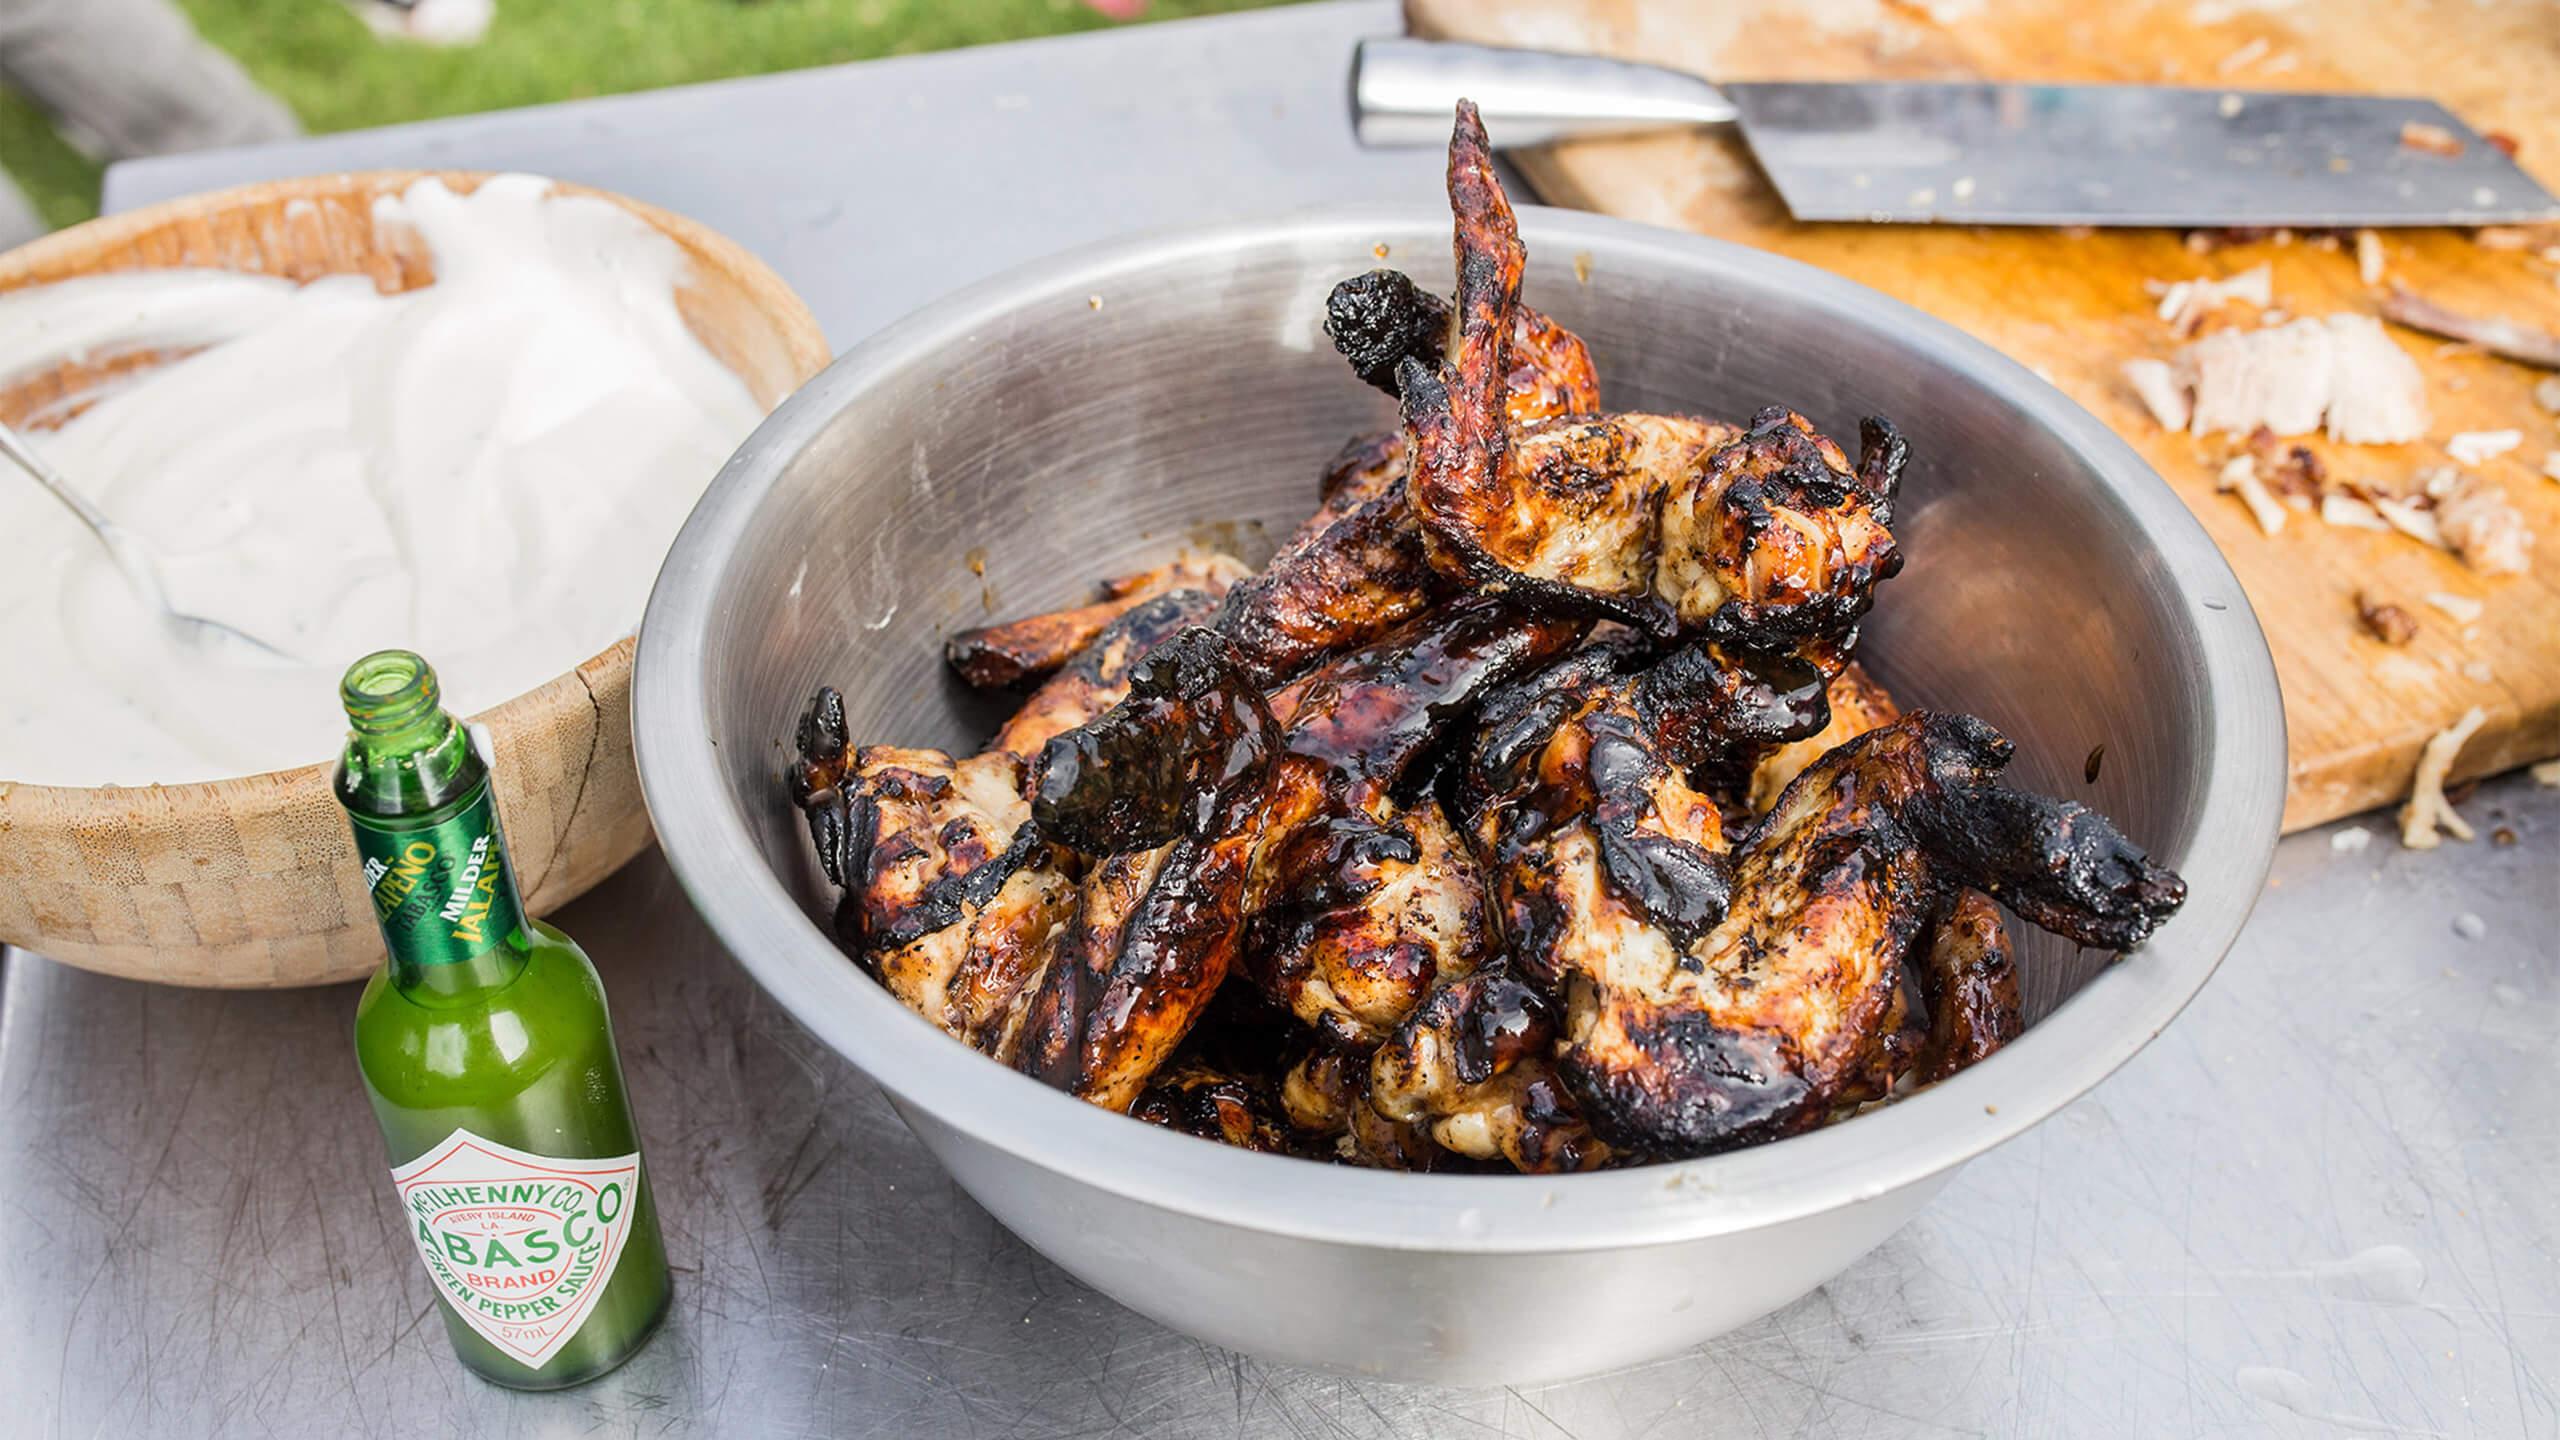 Adobo Glazed Chicken Wings